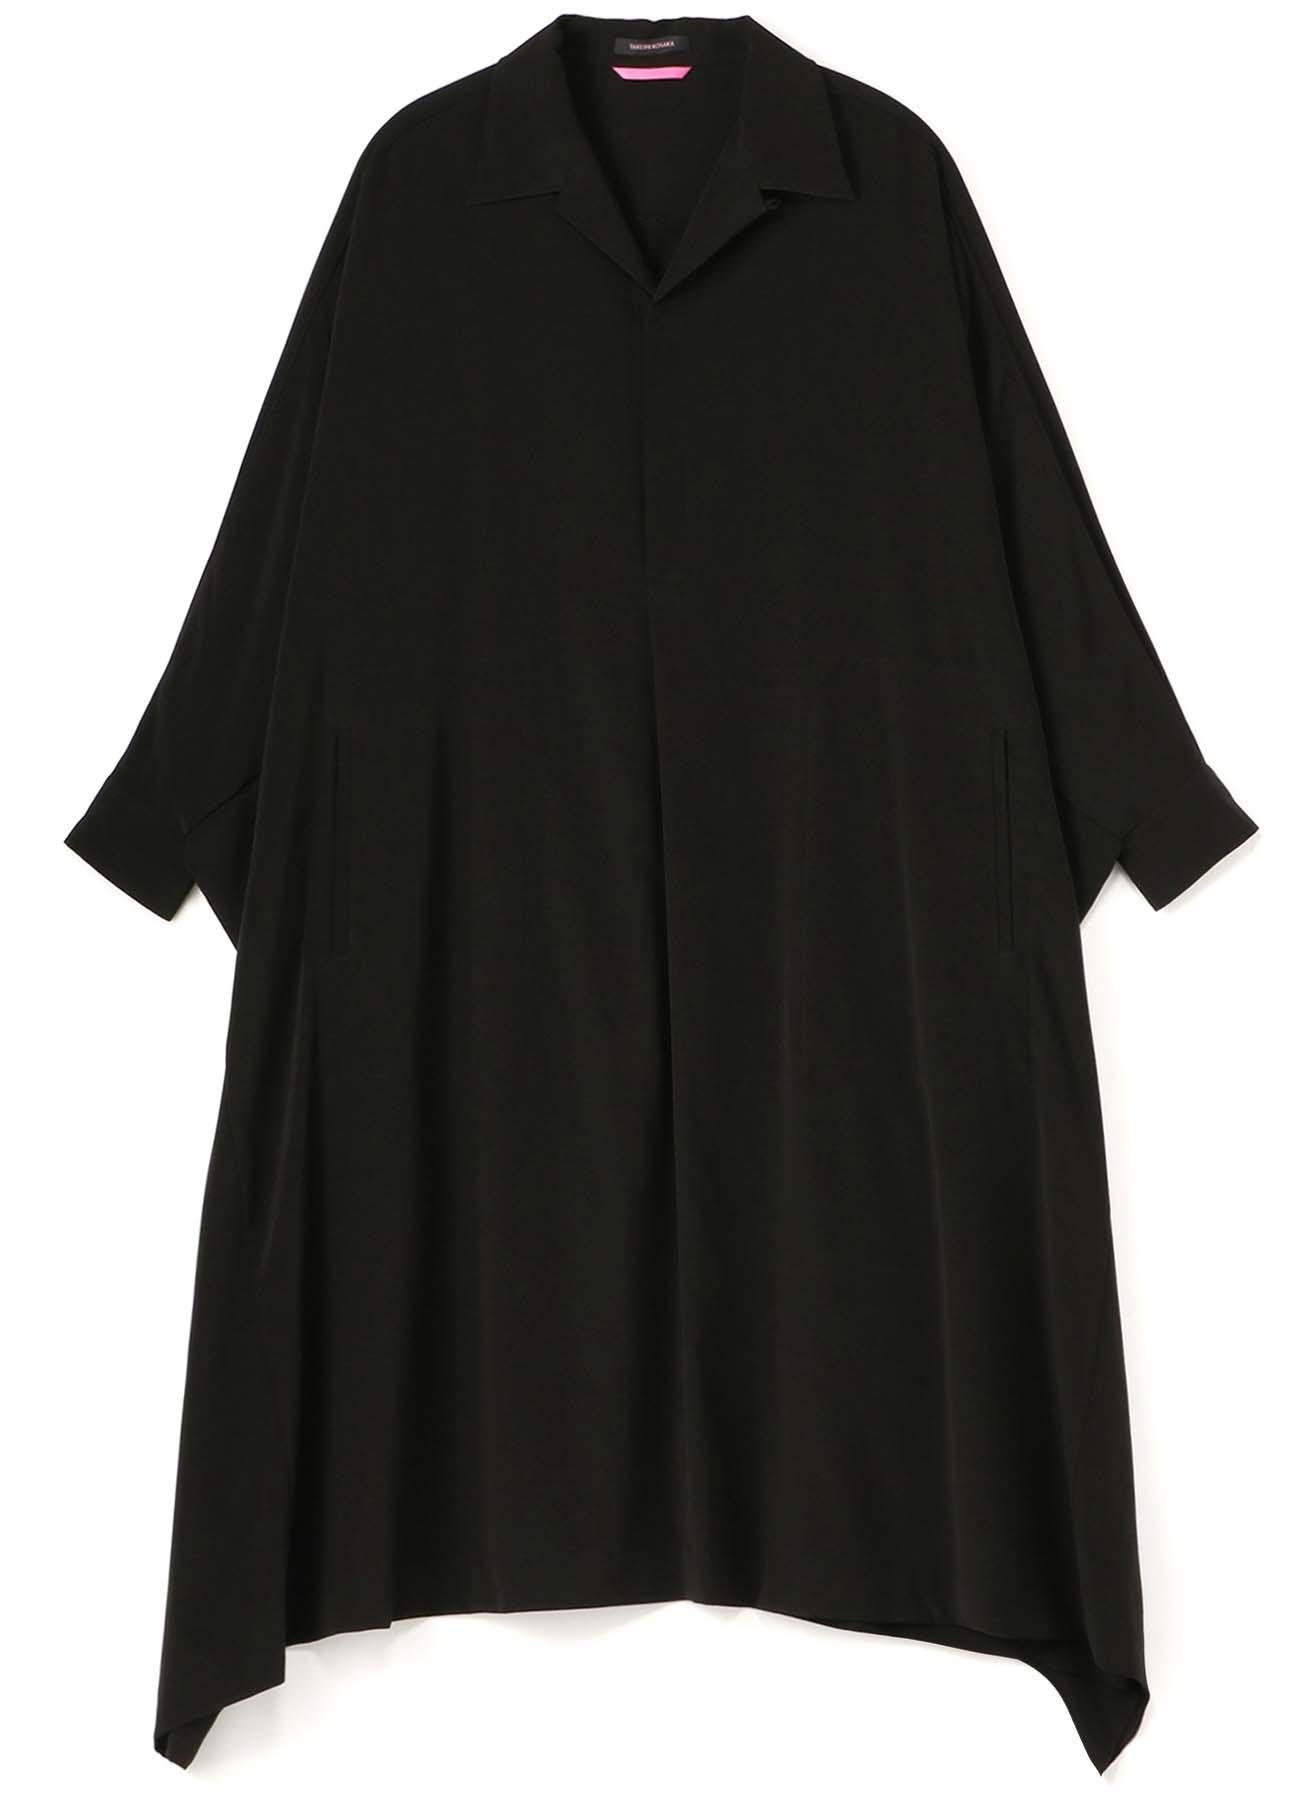 TRIACETATE POLY TUSSAR BIG SHIRT DRESS